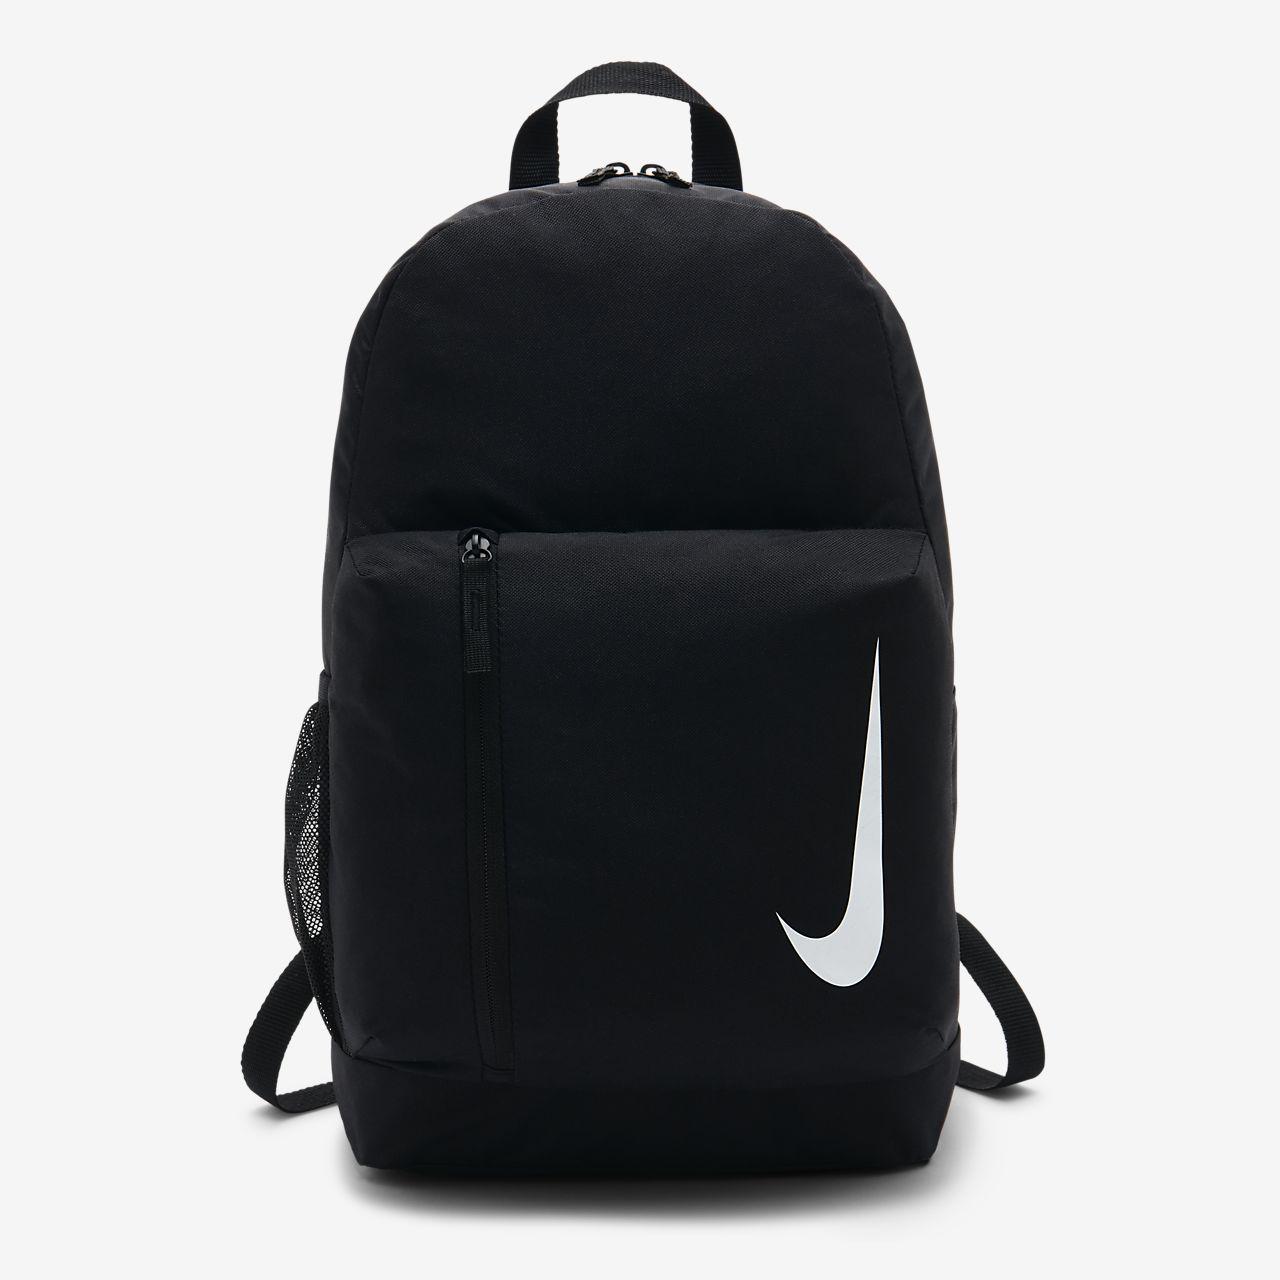 Fotbollsryggsäck Nike Academy Team för barn